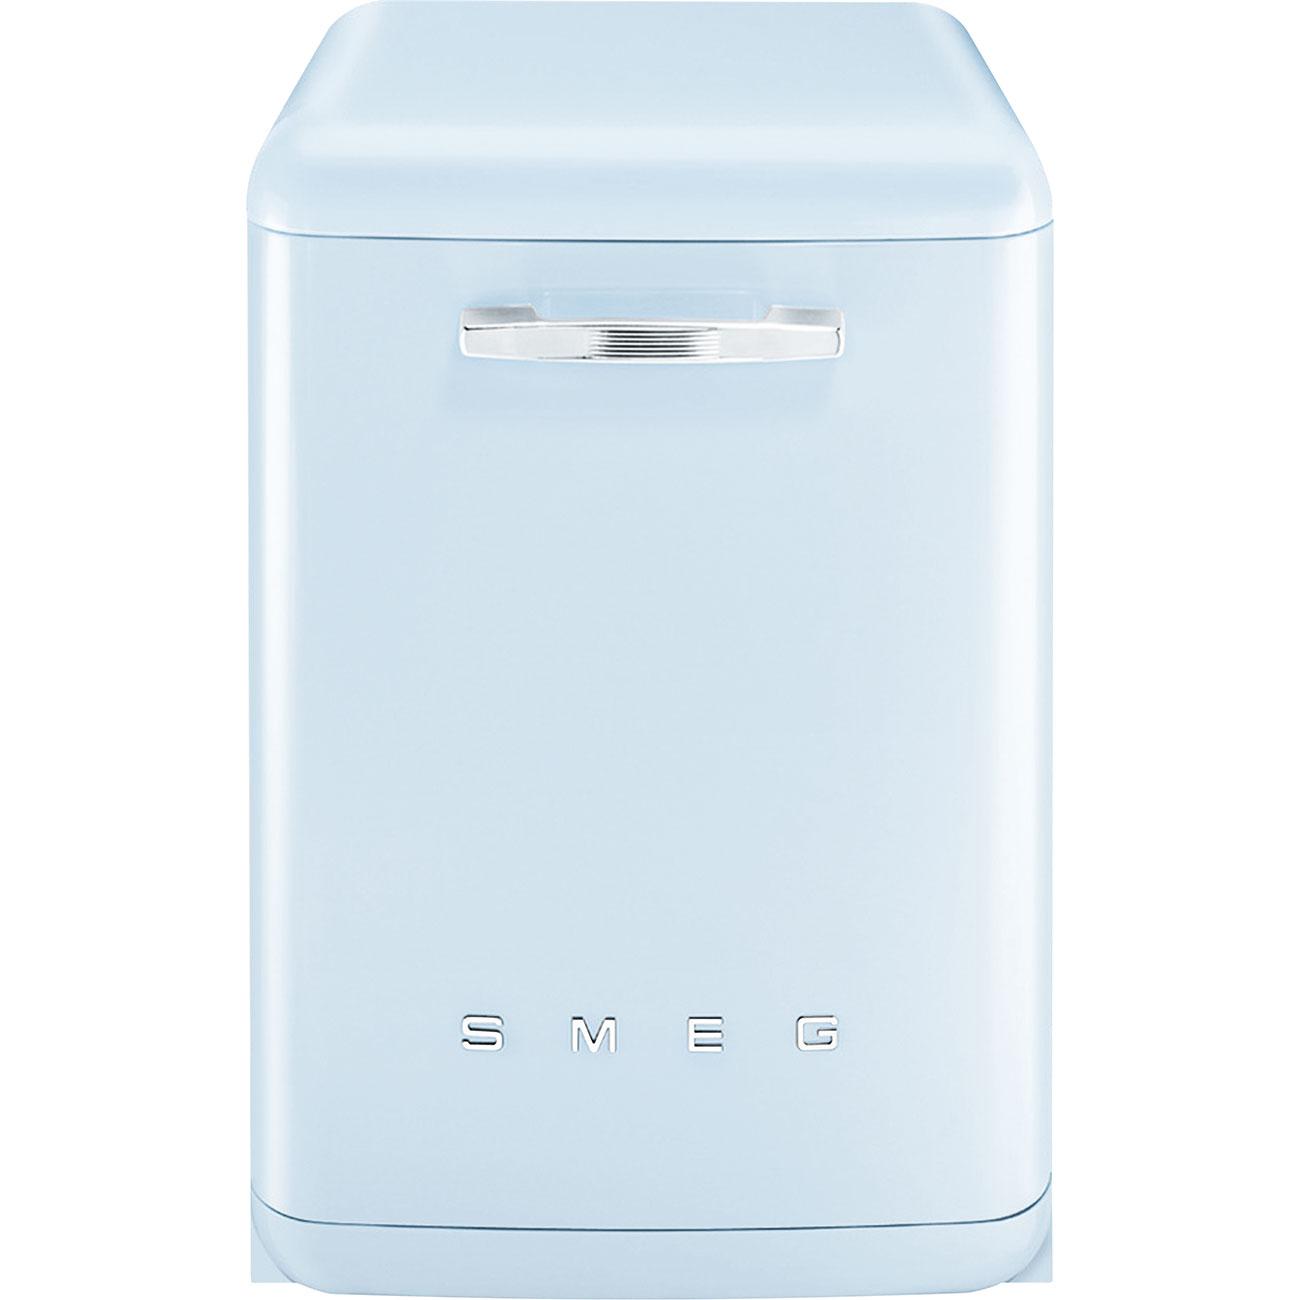 SMEG LVFABPB2 Integrierter Geschirrspüler Pastellblau